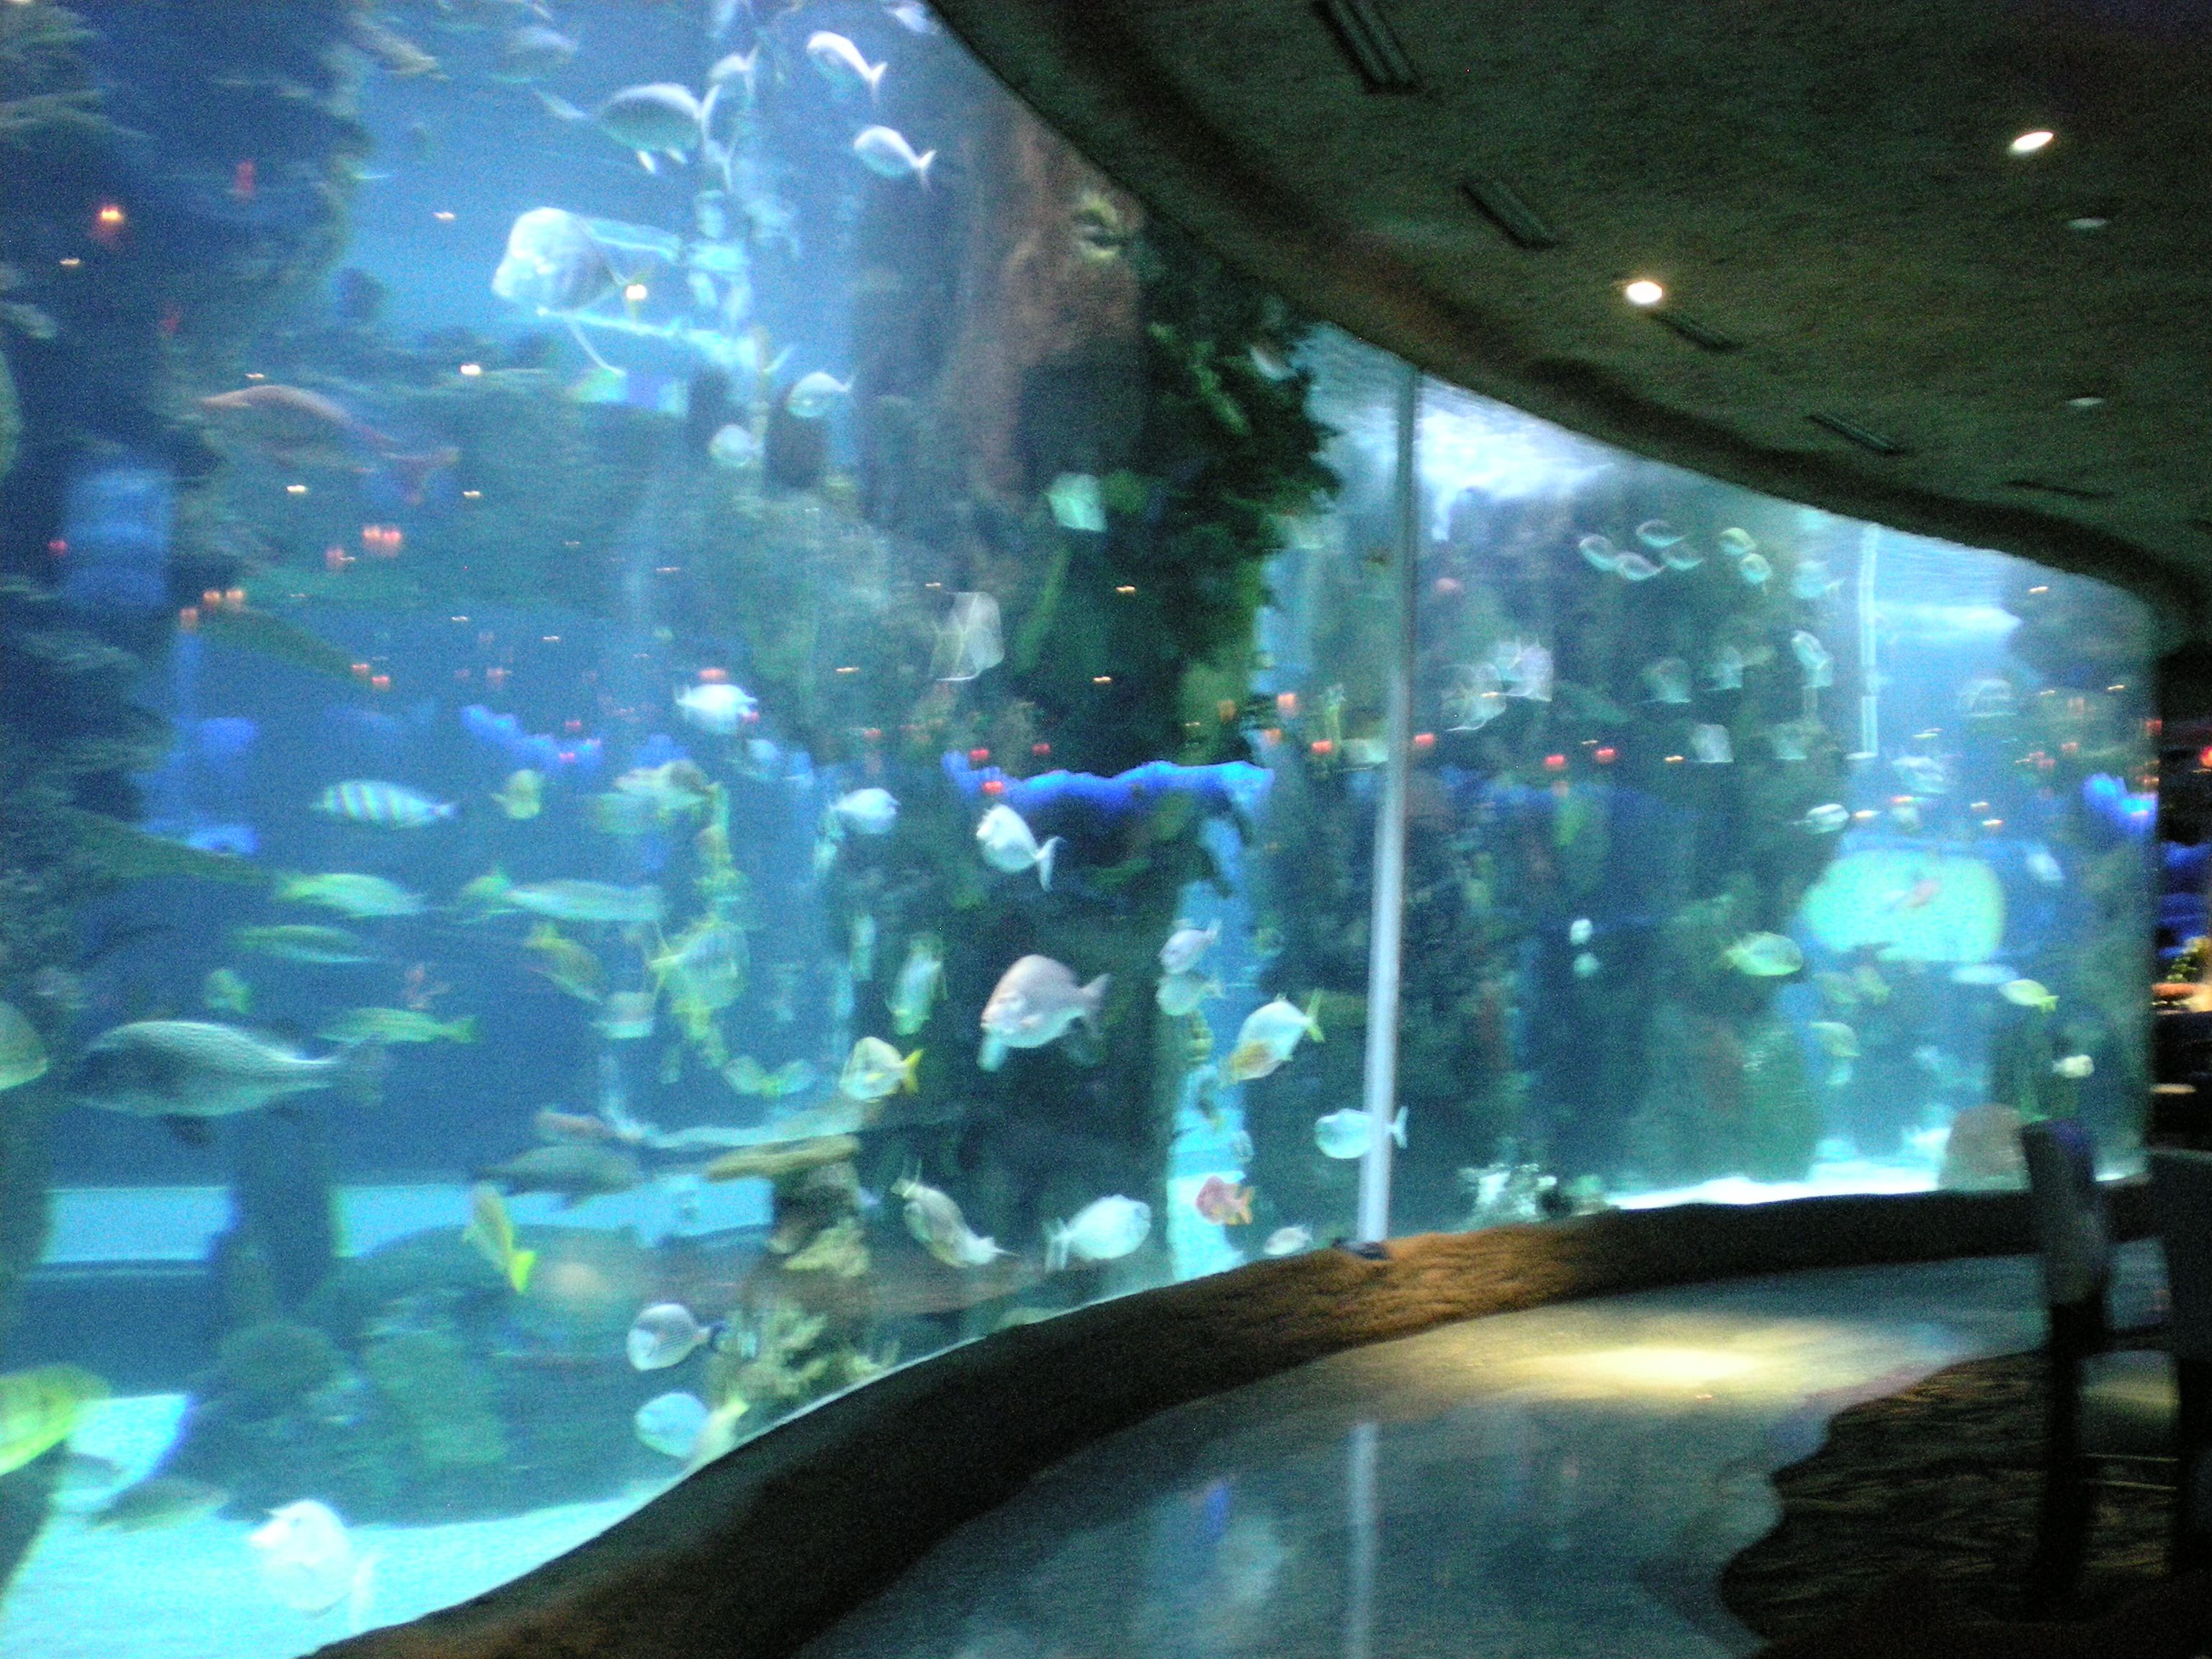 Aquarium Restaurant at Opry Mills, Nashville, TN ...